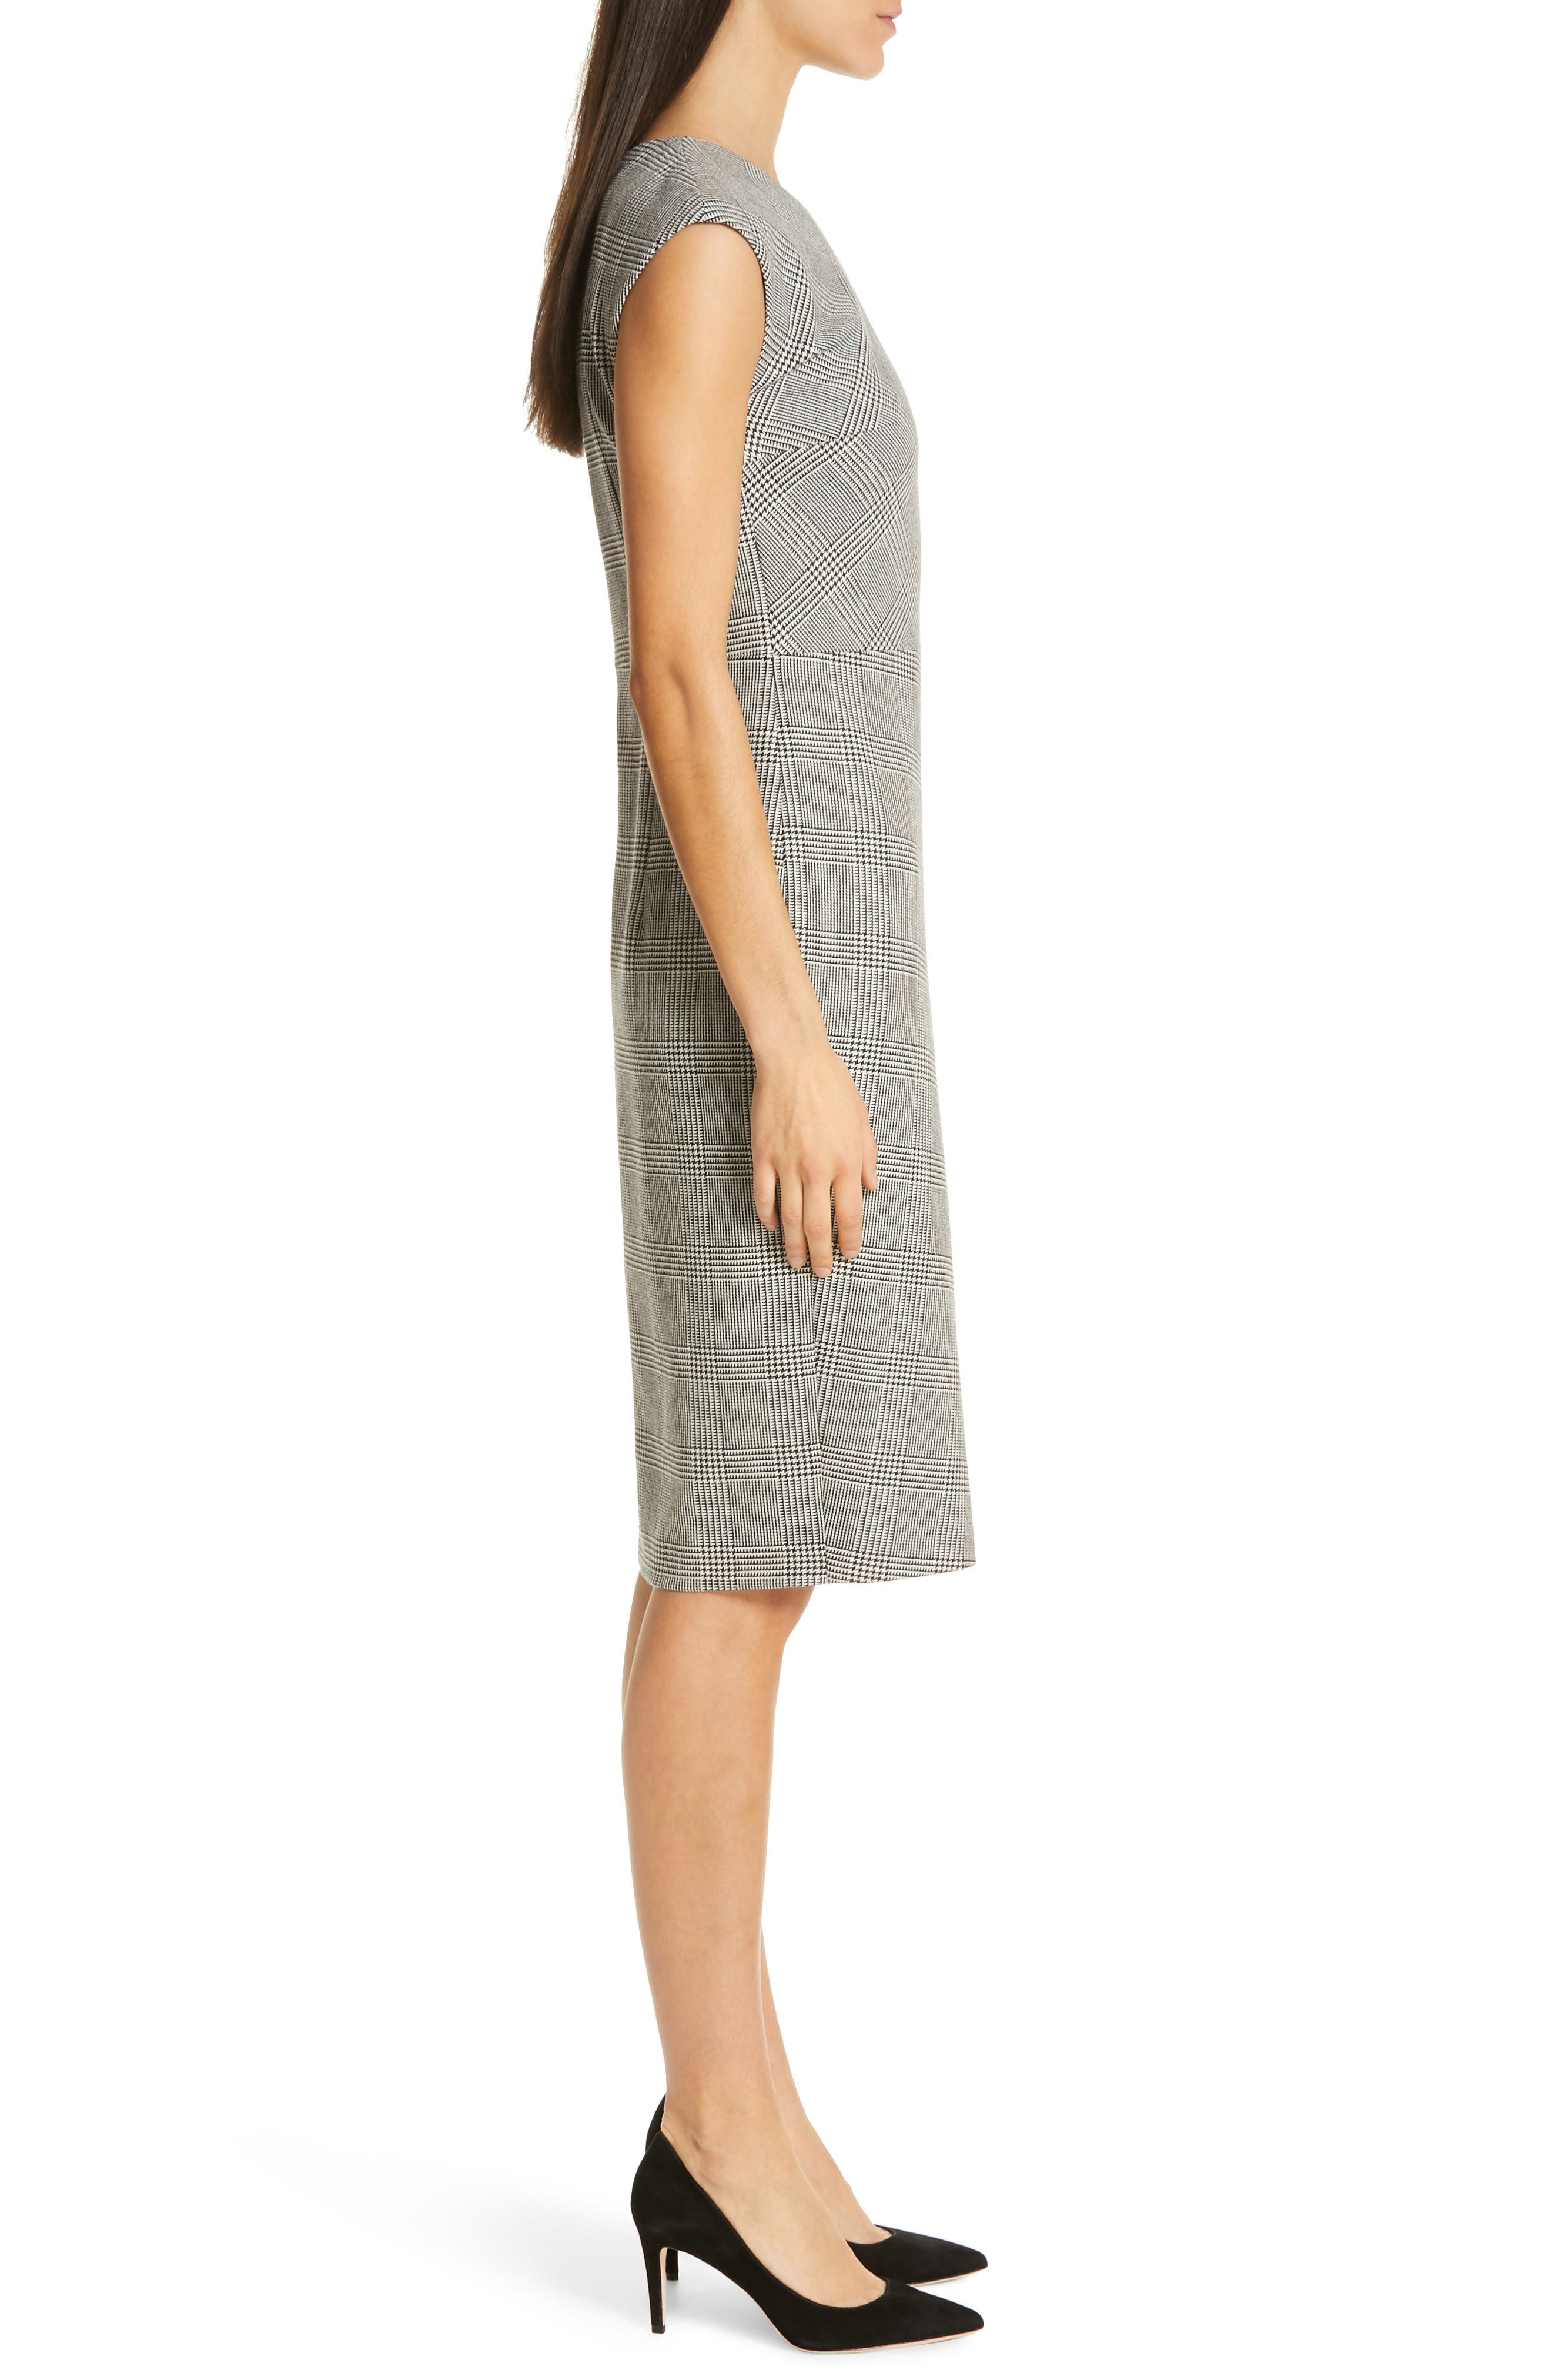 BOSS, Dechesta Glen Plaid Sheath Dress, Alternate thumbnail 4, color, 020